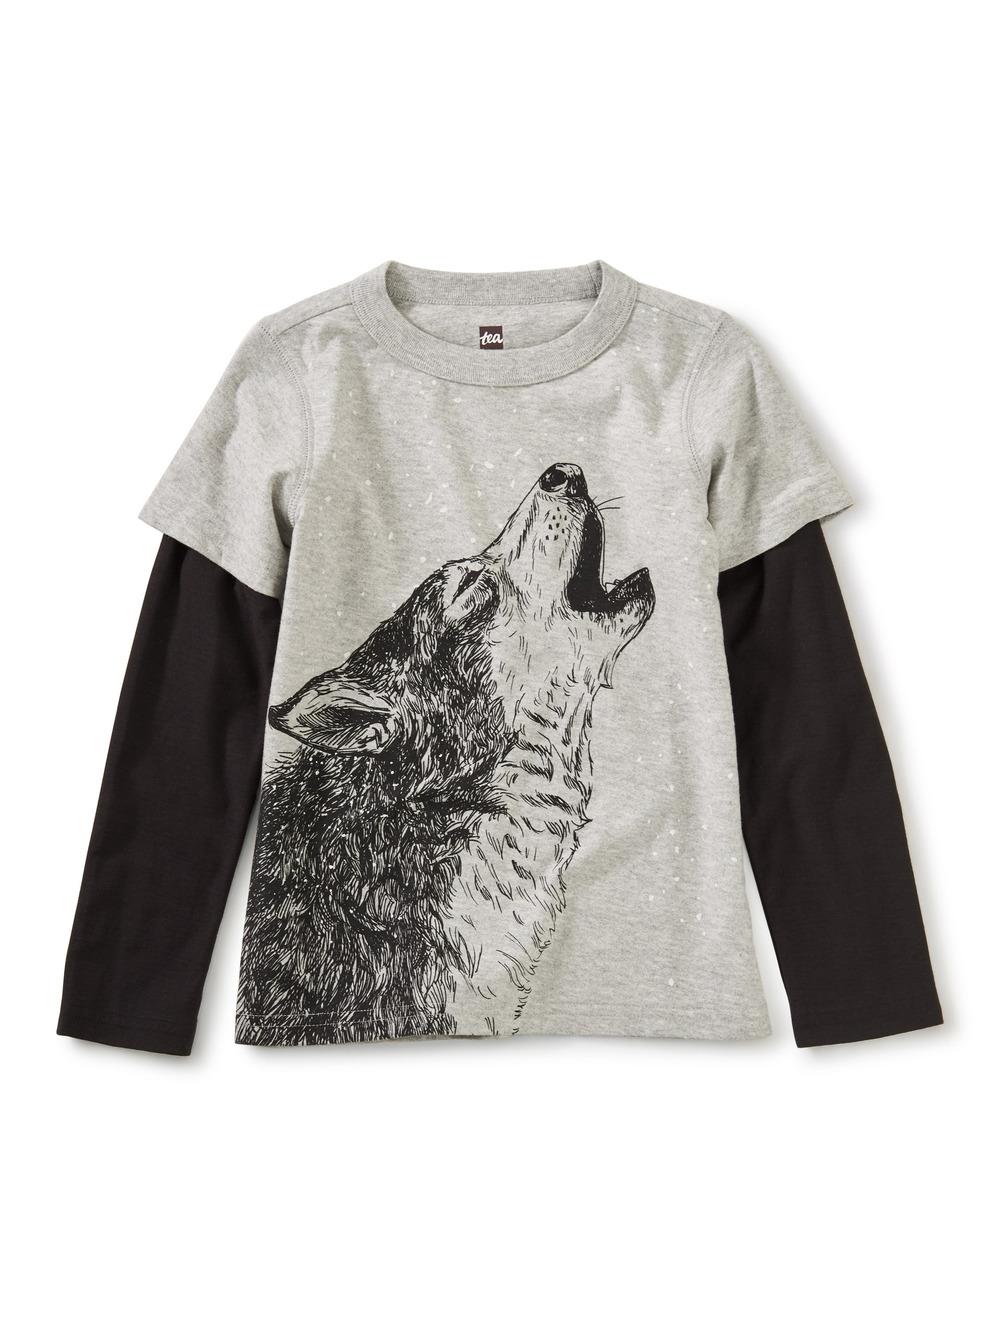 Husky Howl Layered Tee